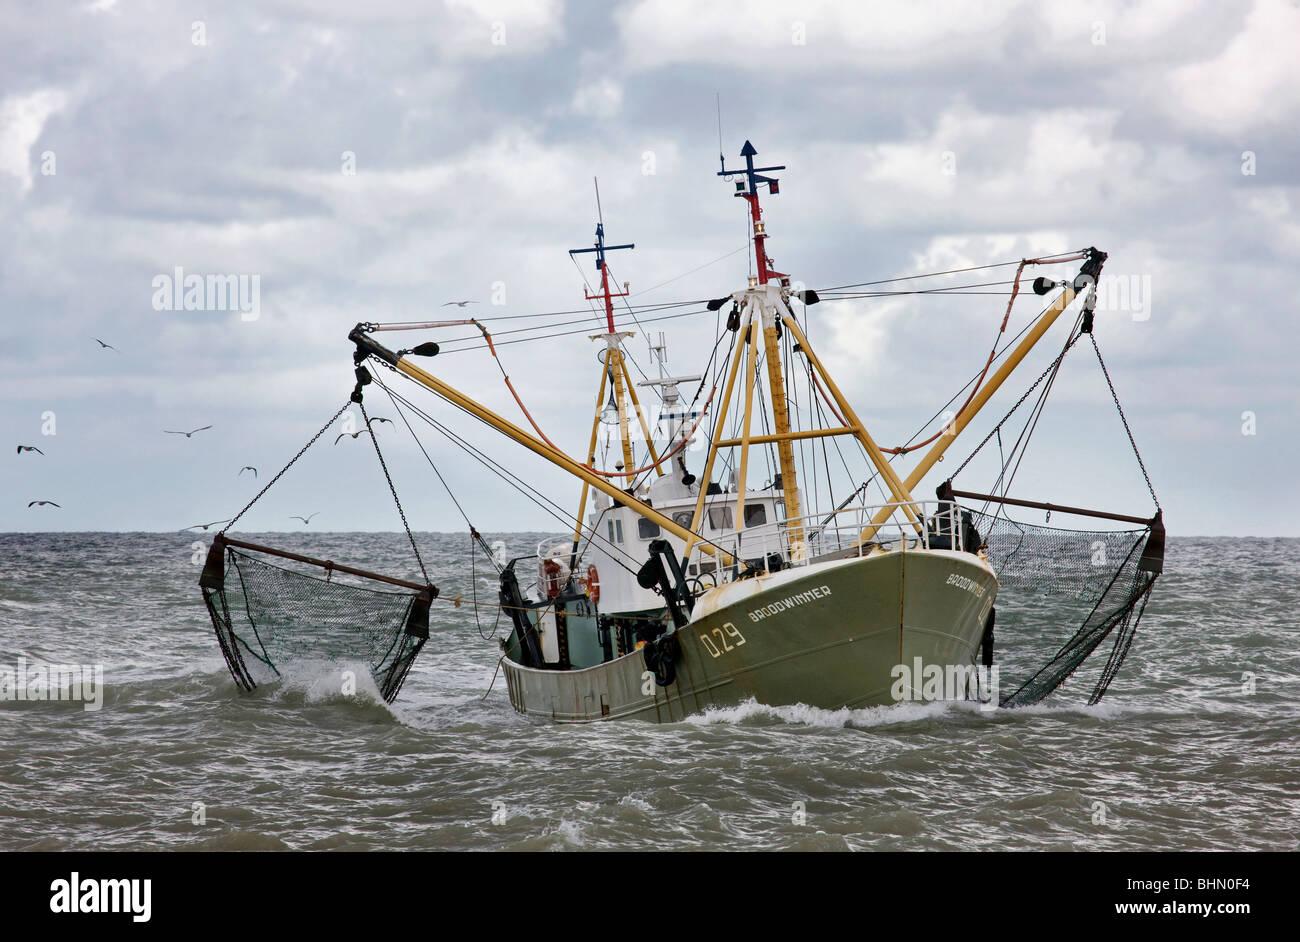 Angelboot/Fischerboot / Trawler an der Nordsee ziehen Fischernetze, Ostende, Belgien Stockbild